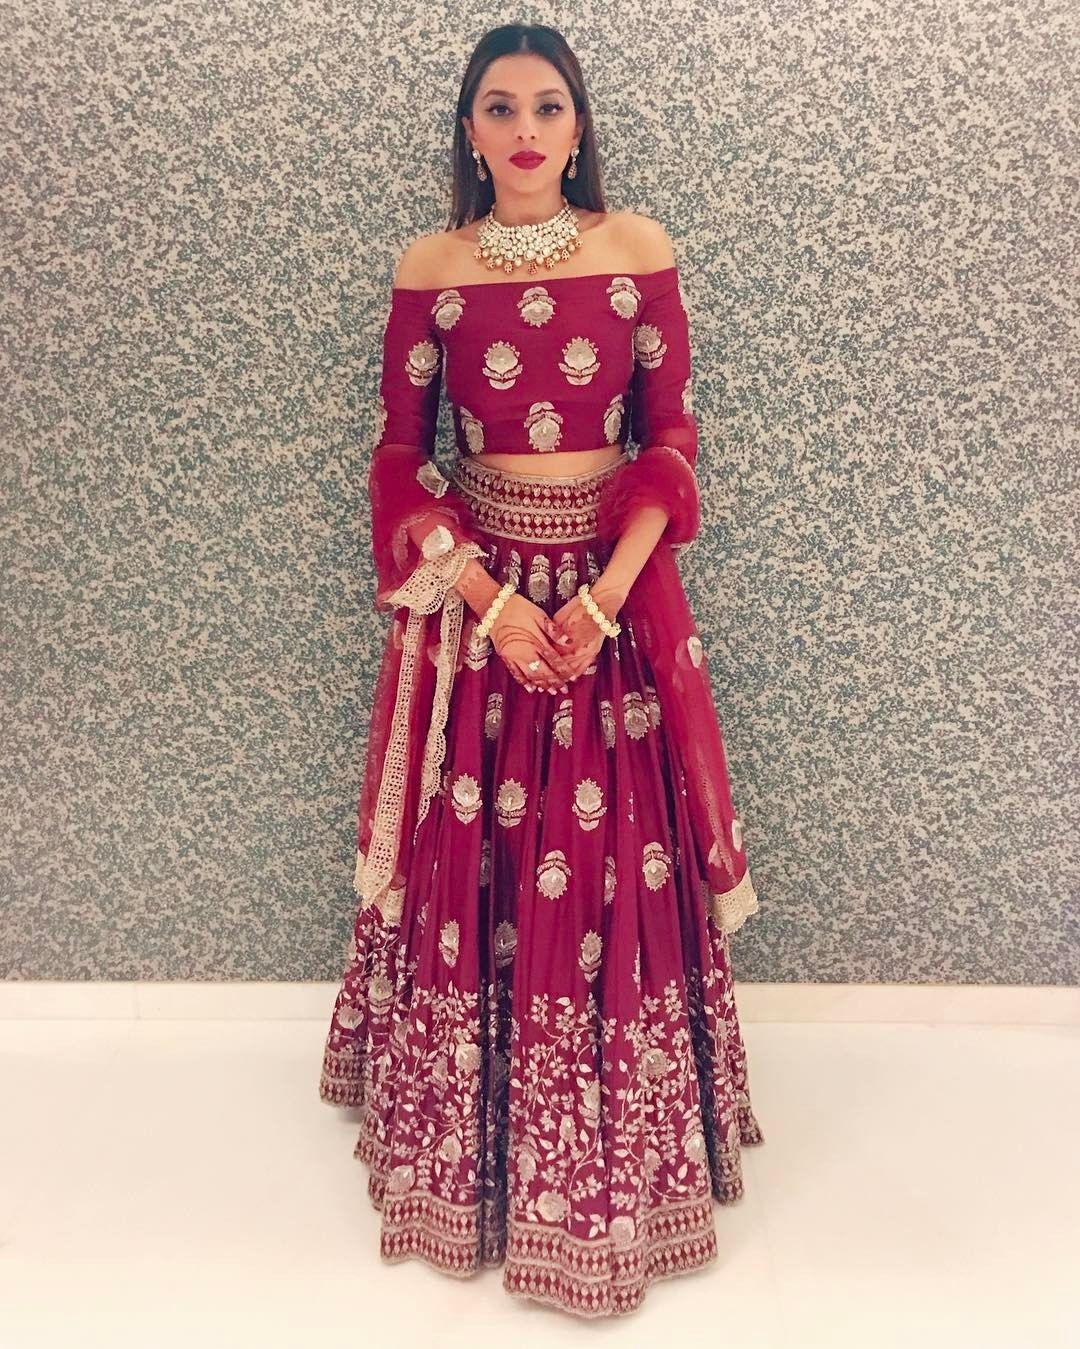 Rajput wedding dress  Pin by Momina Zahid on Wedding dresses  Pinterest  Rounding Desi